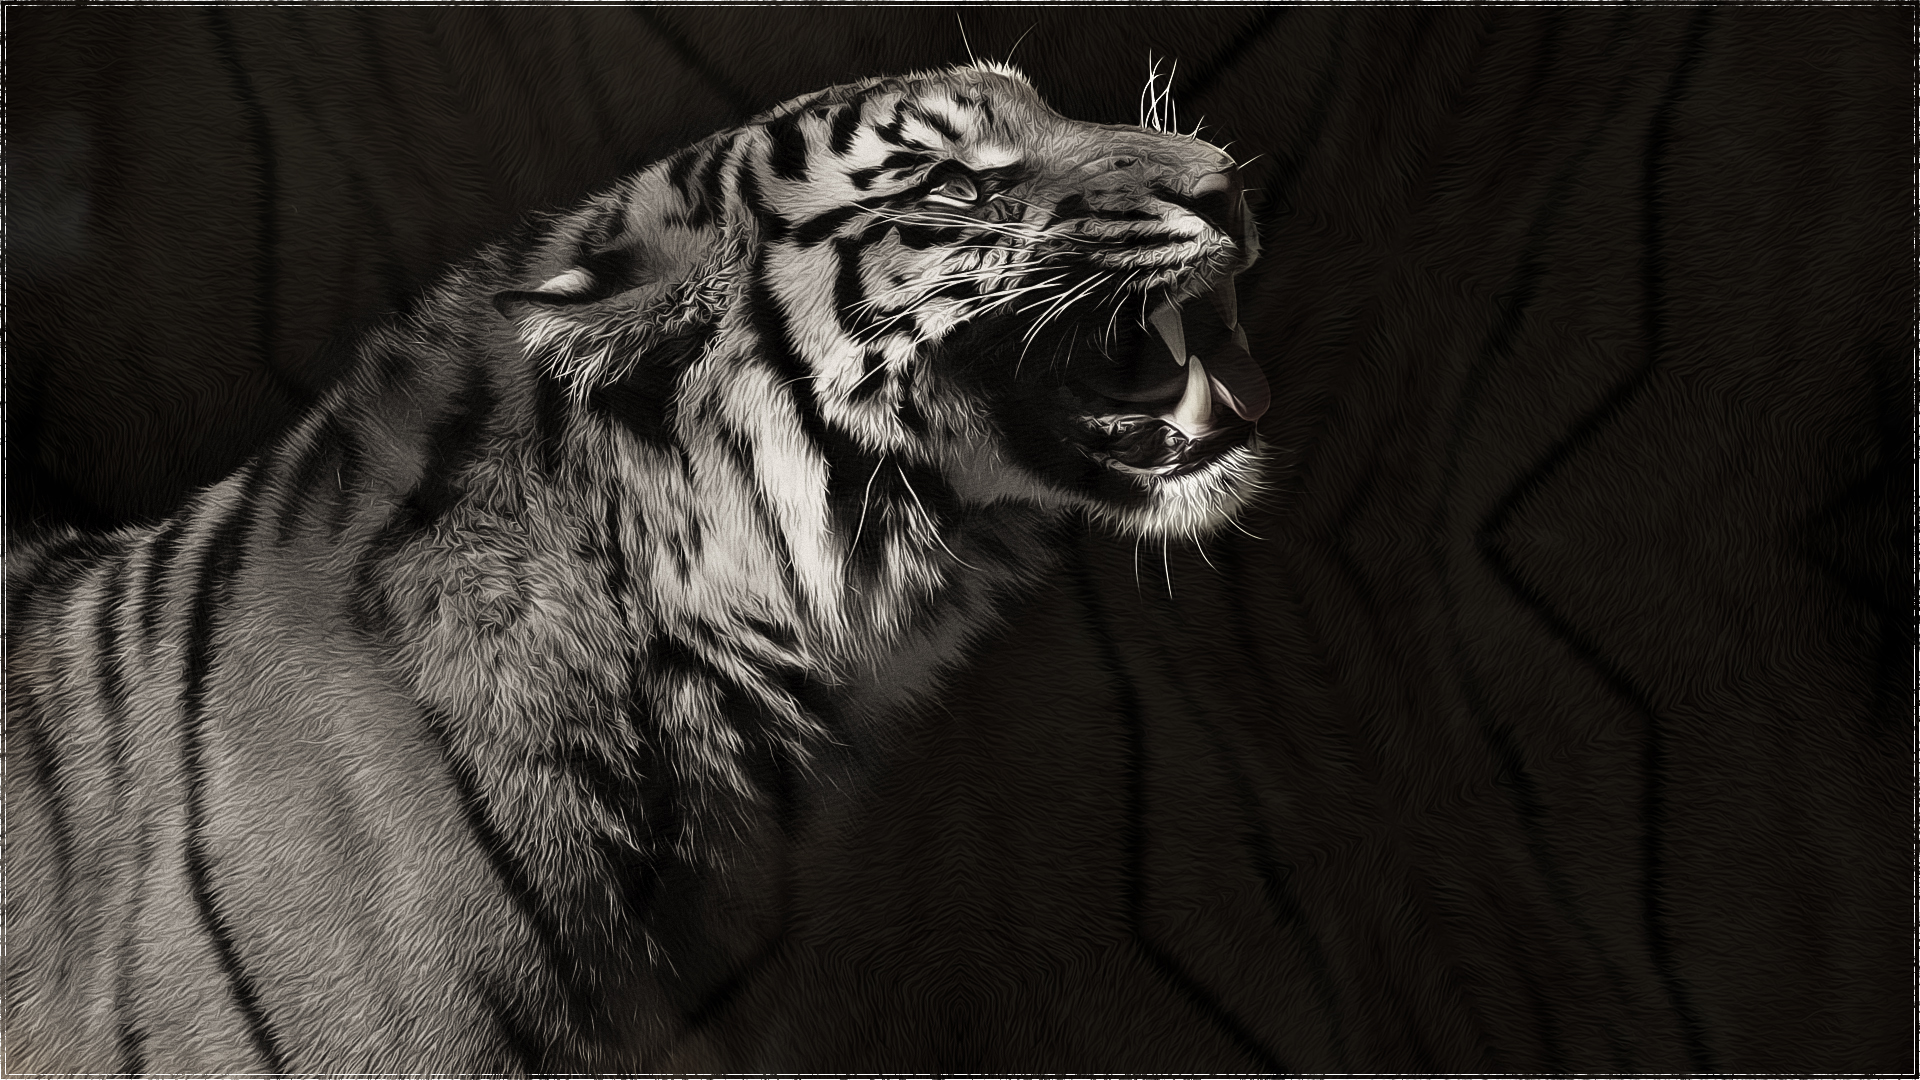 White tiger hd wallpaper background image 1920x1080 - Animal black background wallpaper ...